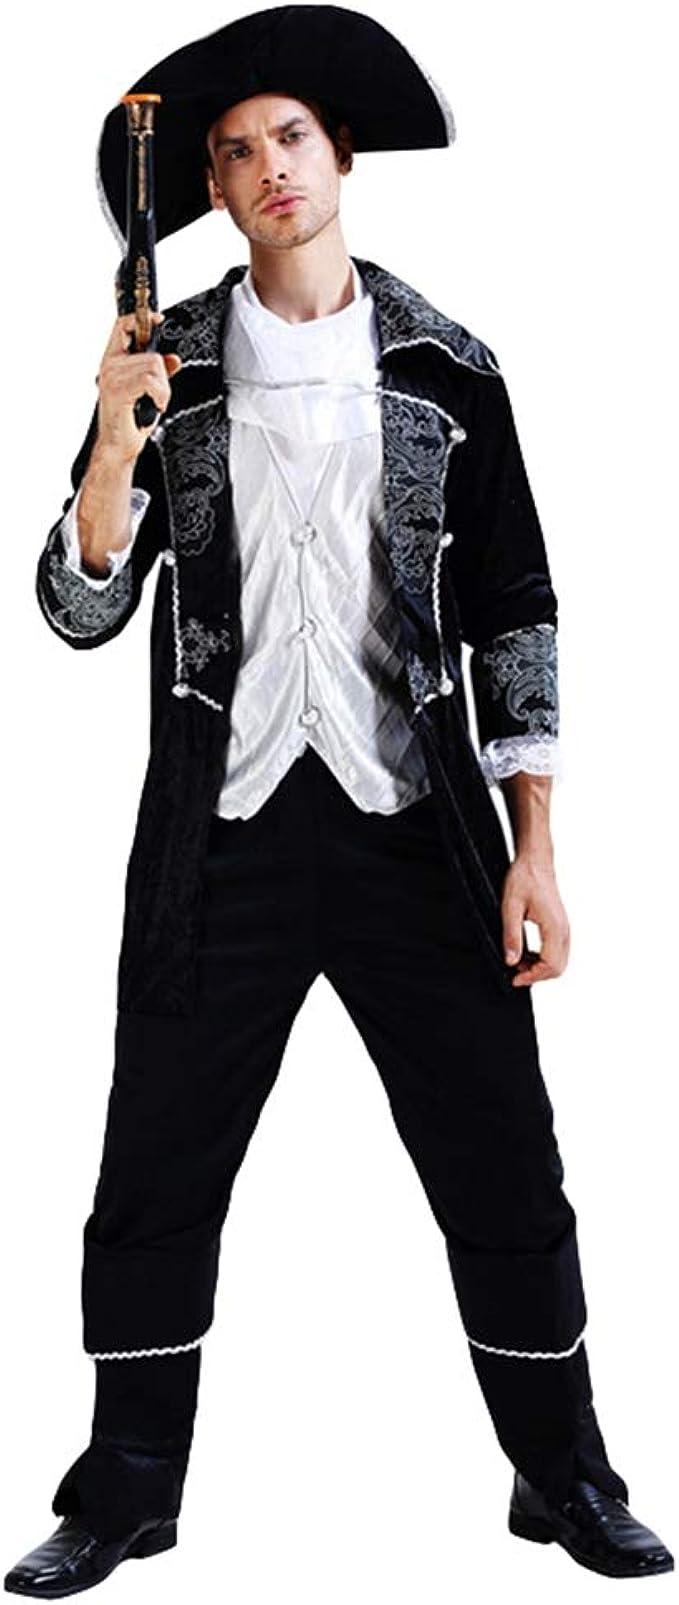 Jitong Trajes de Piratas Gracioso, Disfraces Halloween Adultos ...